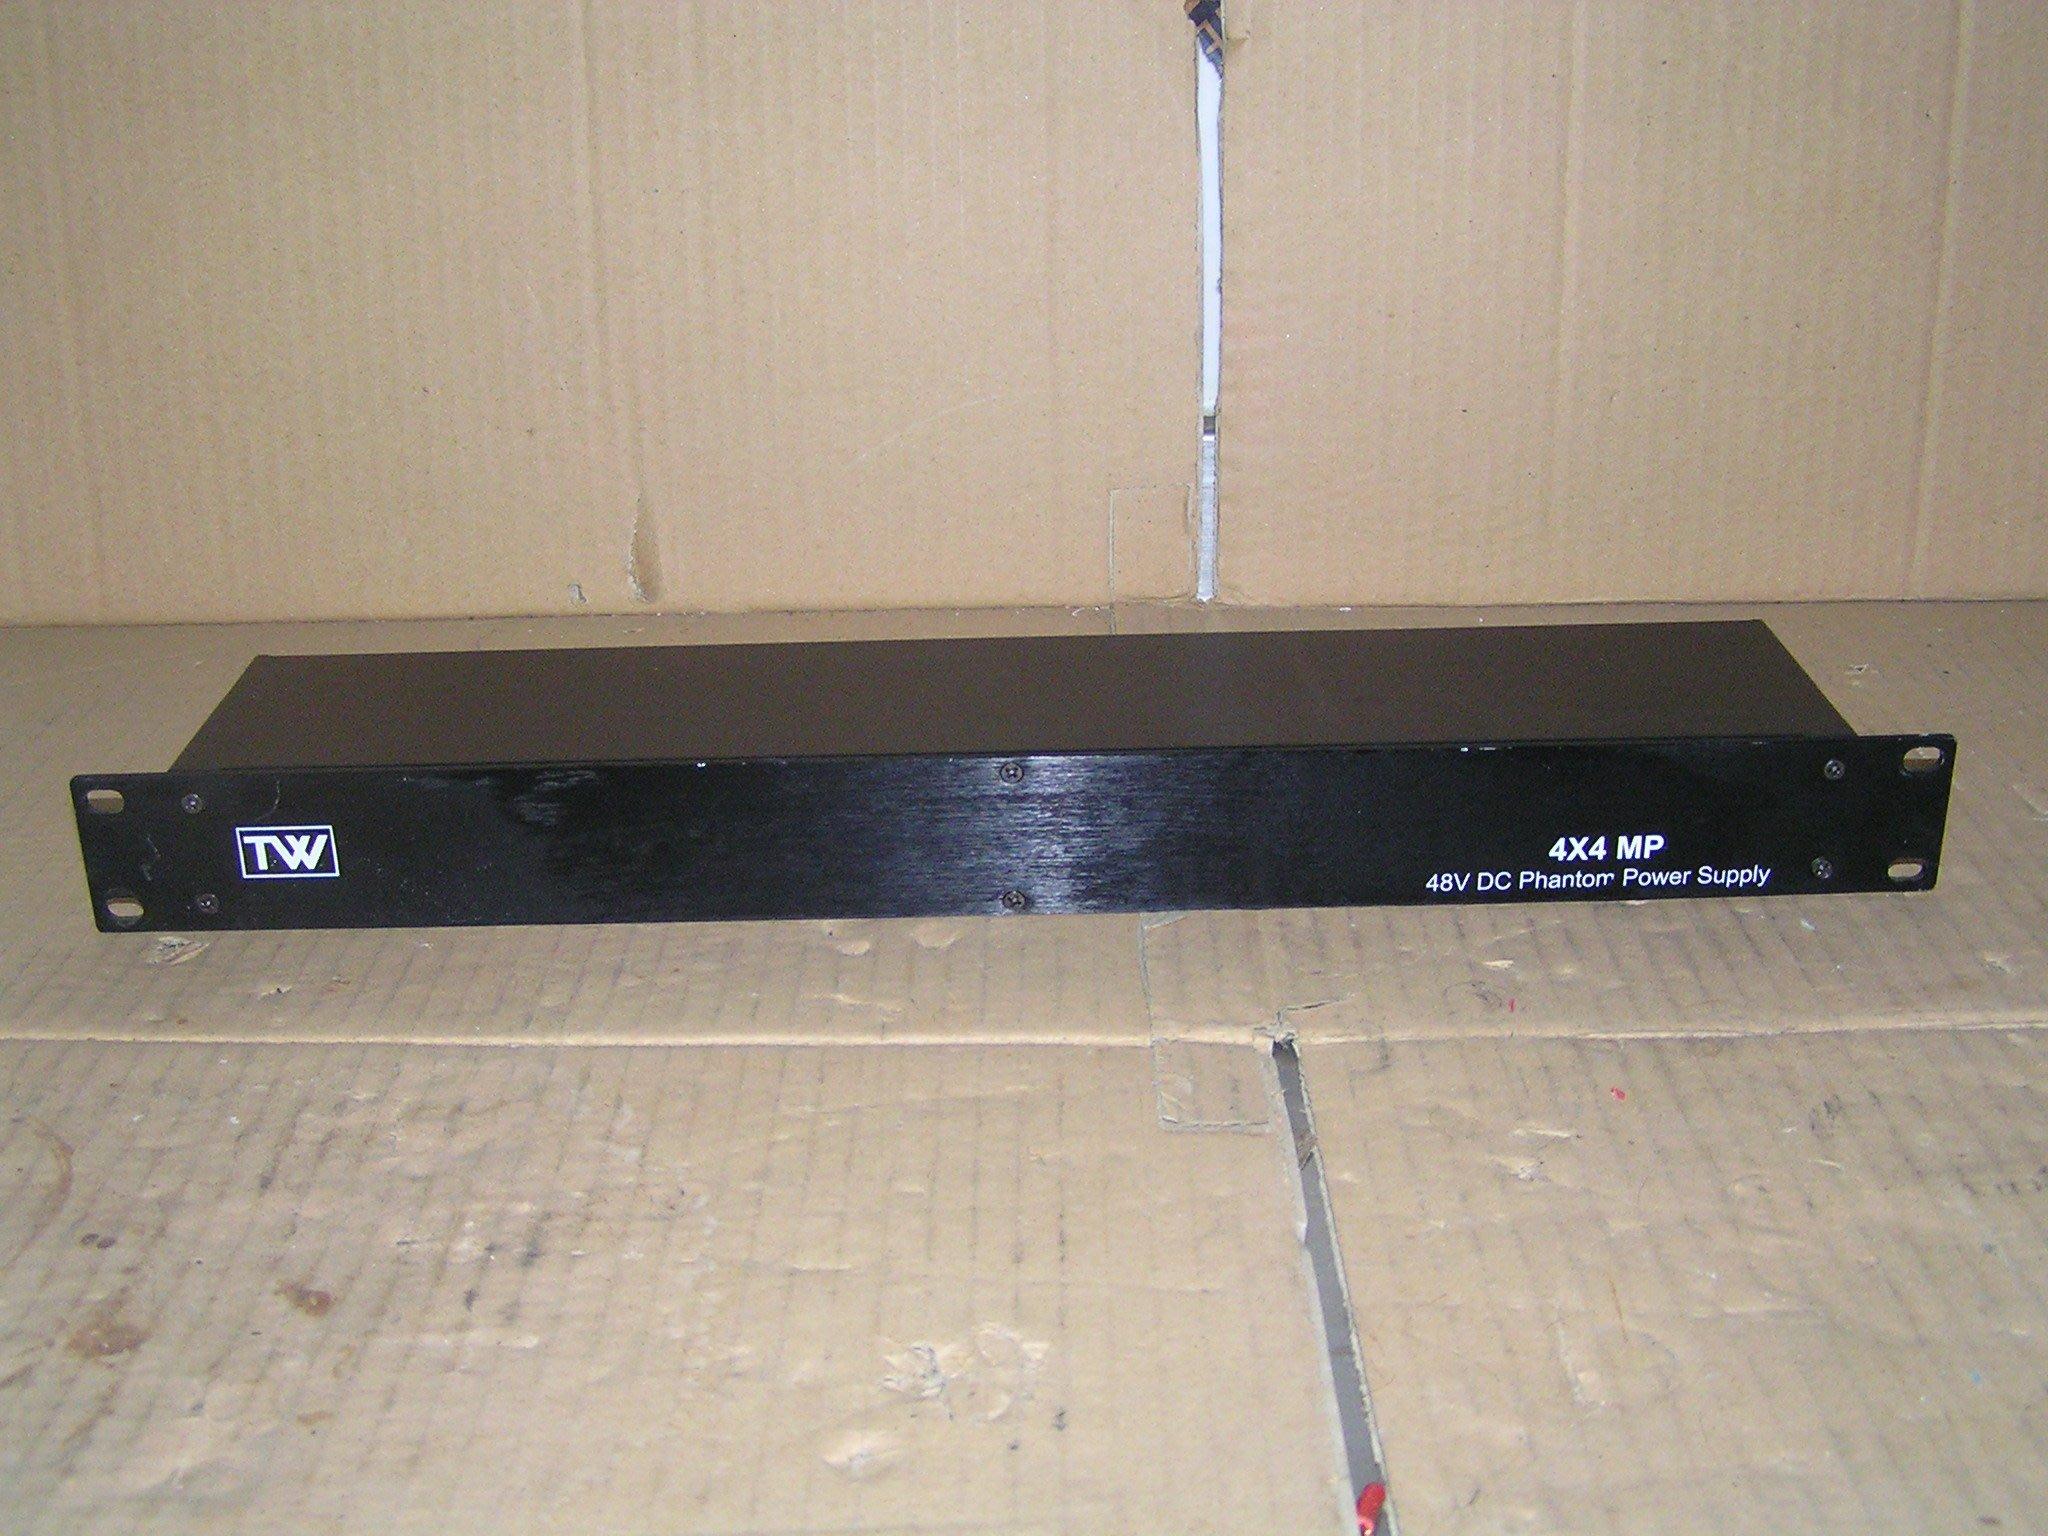 TW 4X4 MP 48V DC PHANTOM POWER SUPPLY